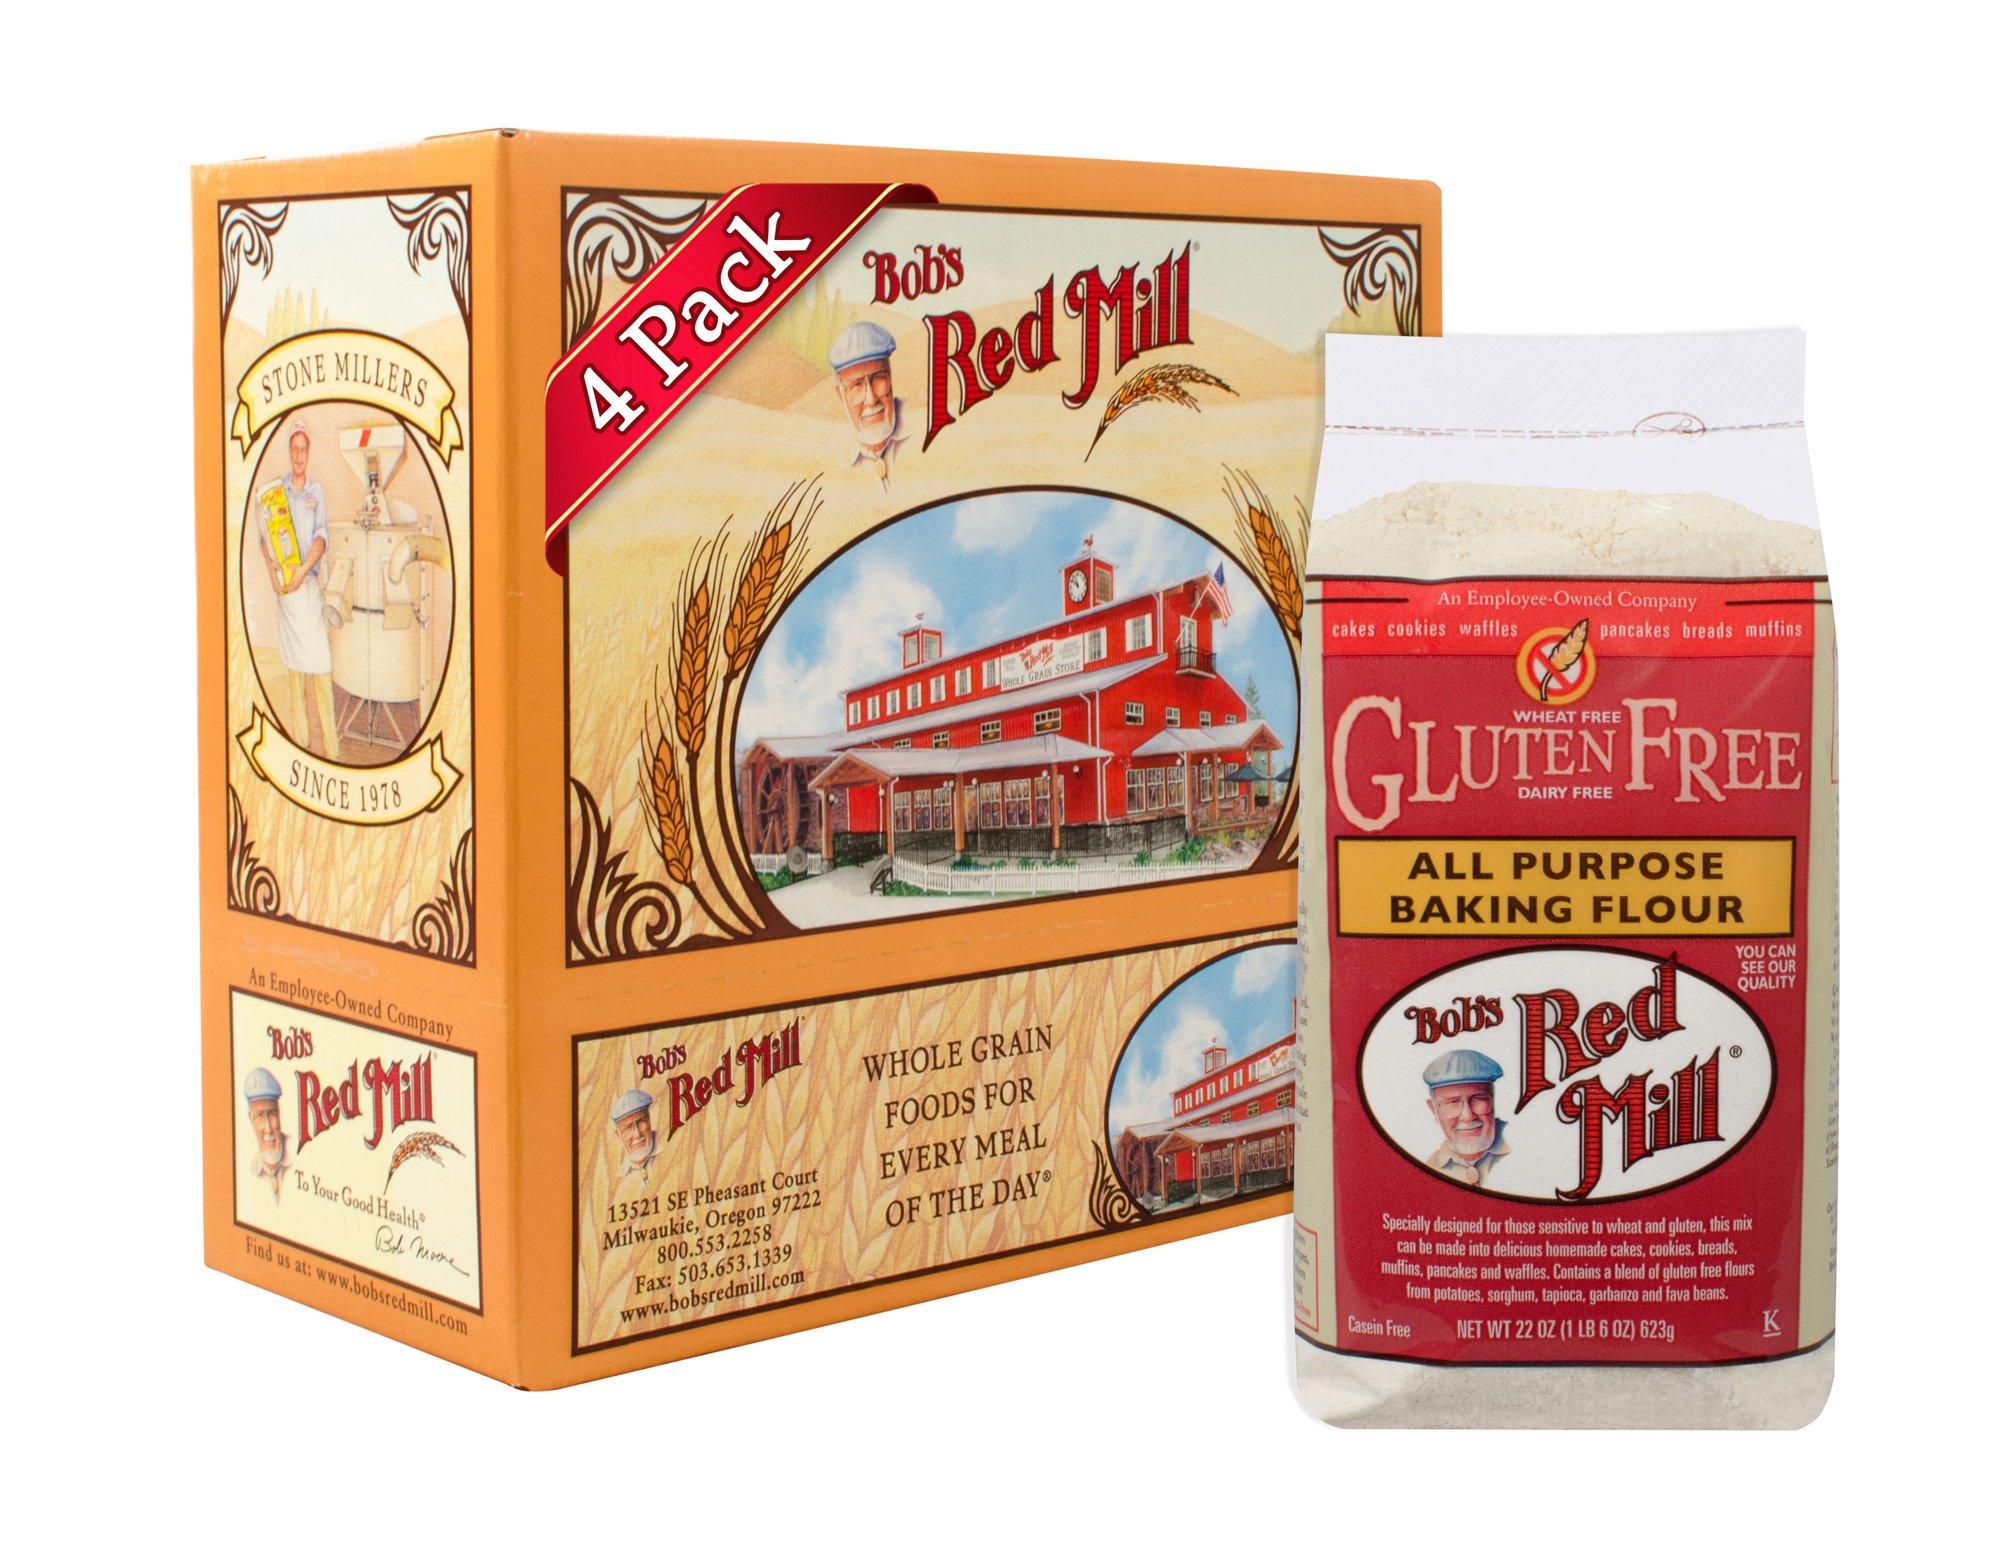 Bob's Red Mill Gluten Free All Purpose Baking Flour, 22 Oz (4 Pack)